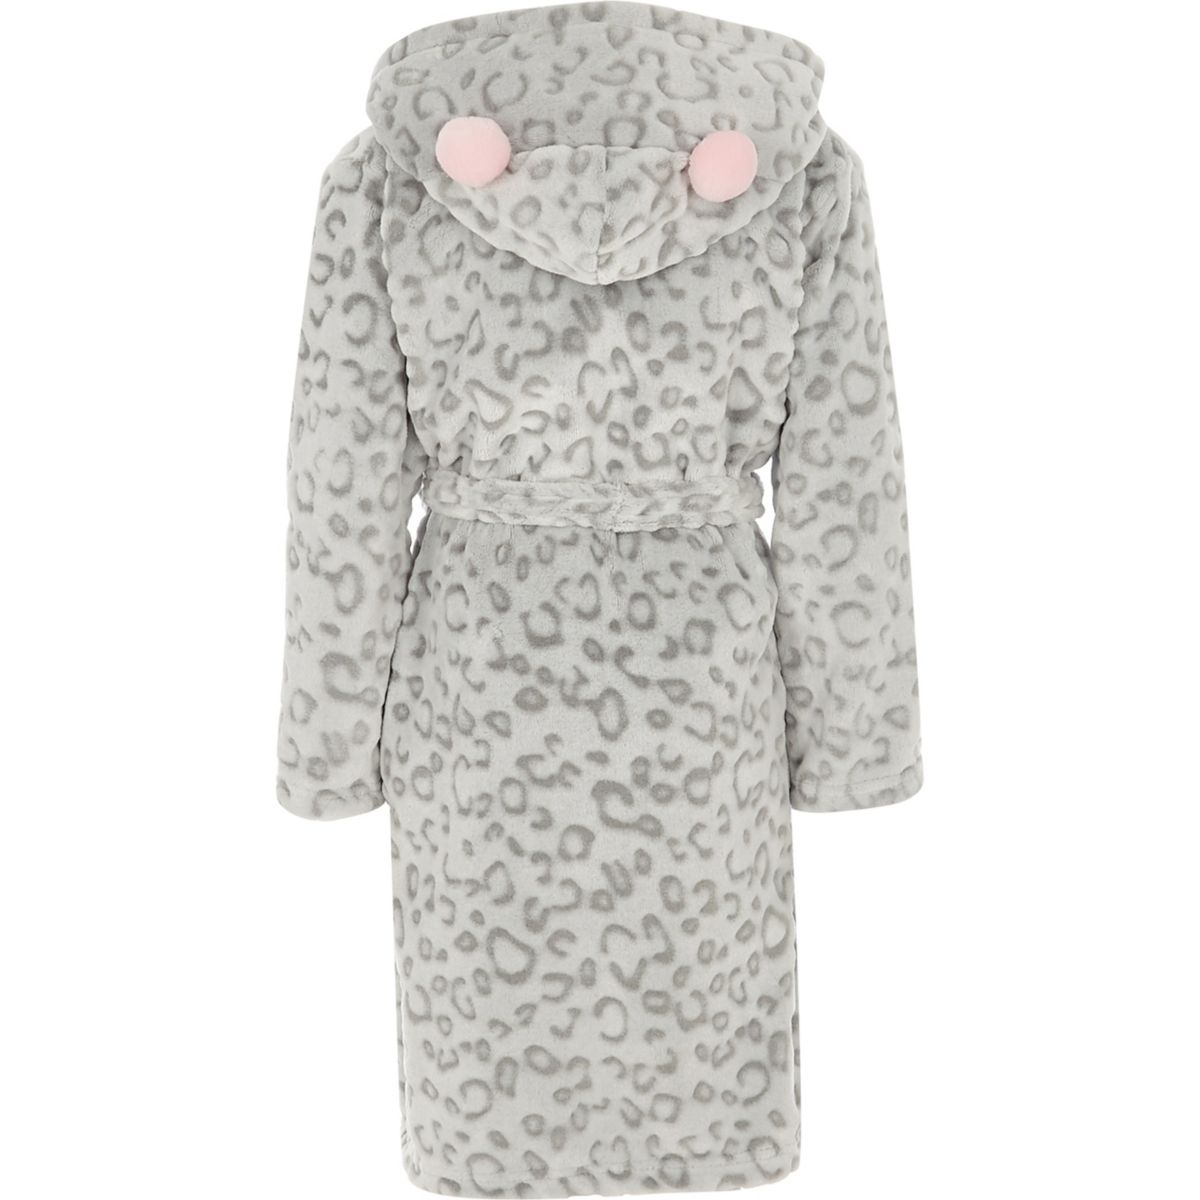 Girls grey leopard print dressing gown - Pyjamas & Underwear - girls